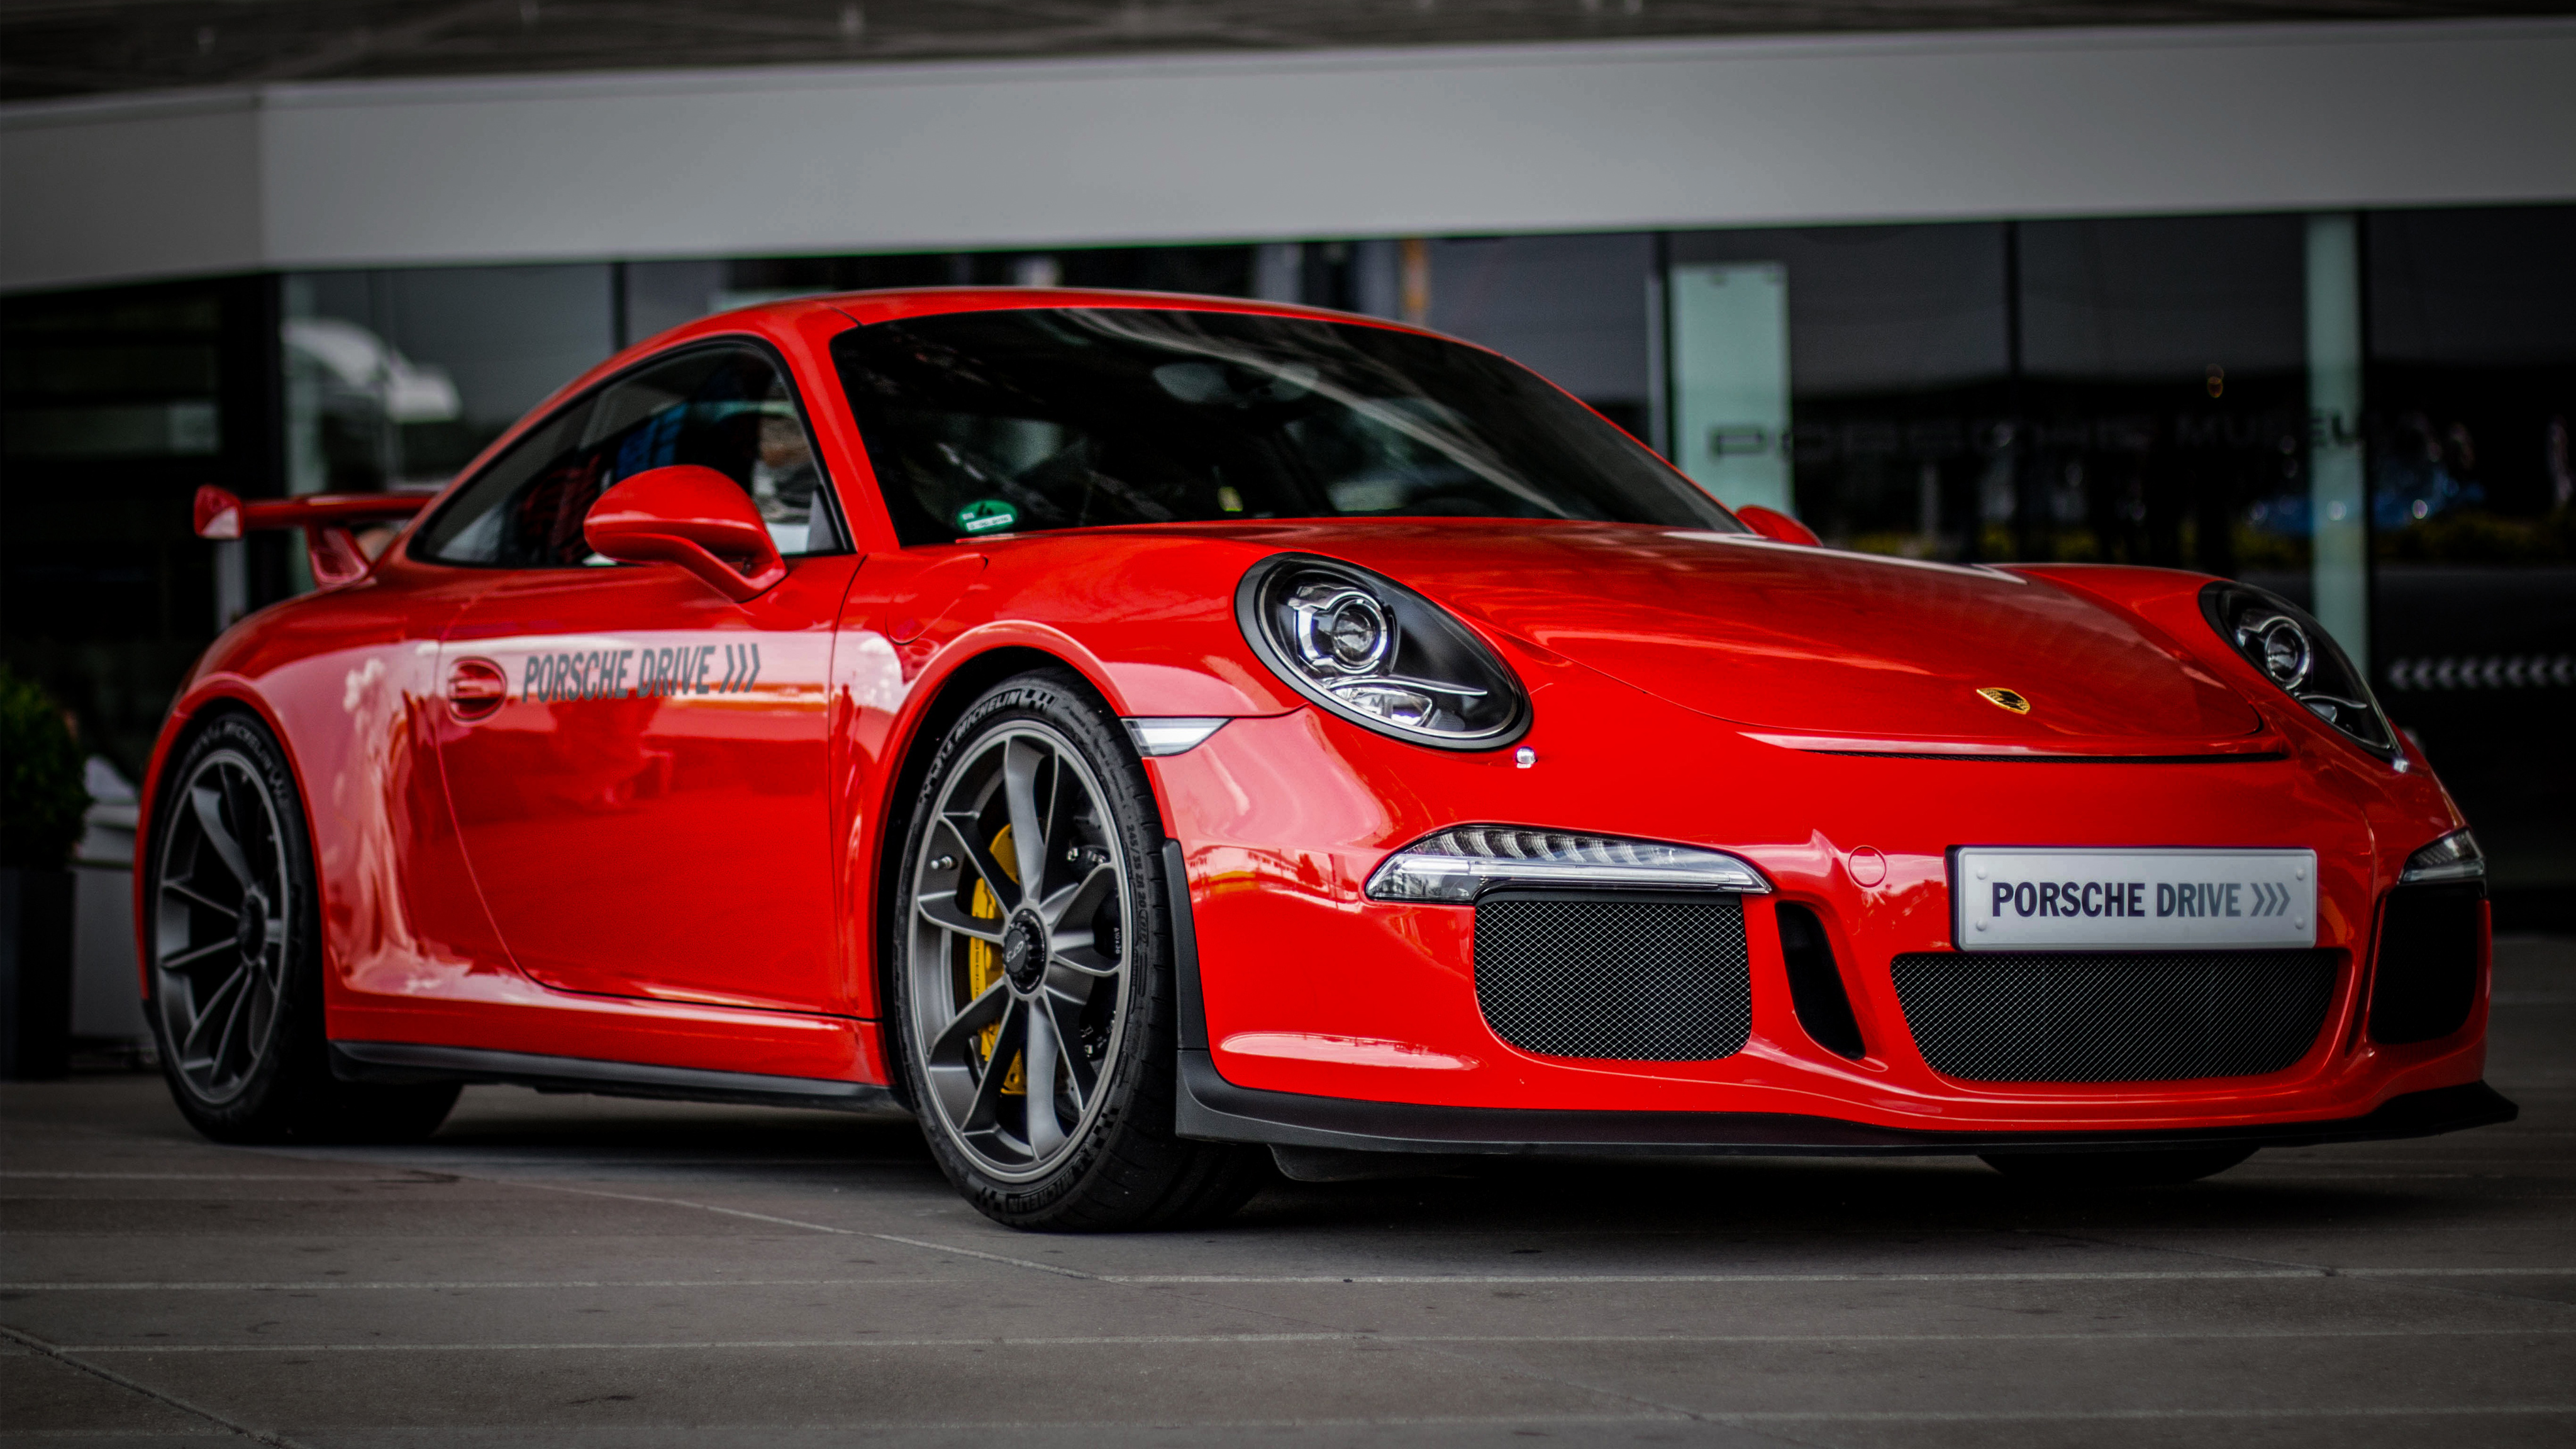 Porsche Drive Supercar 4k Wallpaper Hd Car Wallpapers